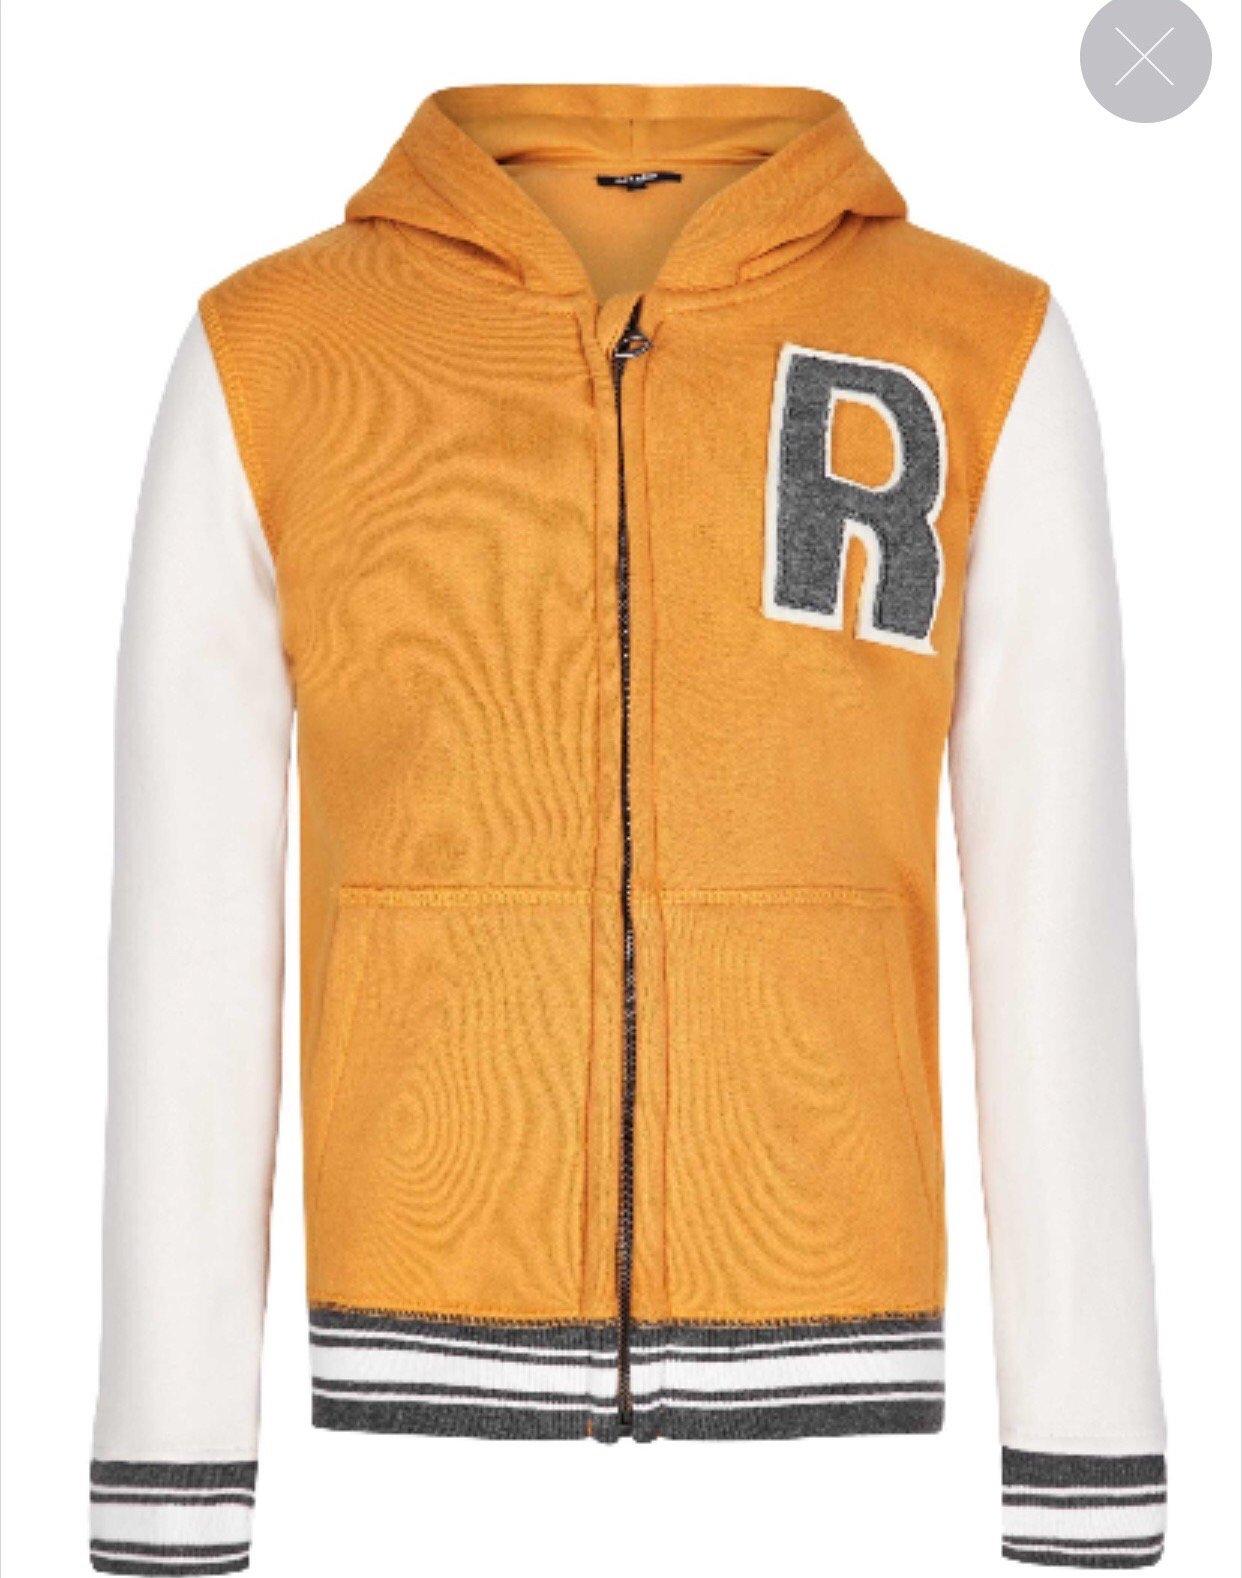 Image of Boys Riot Club jacket